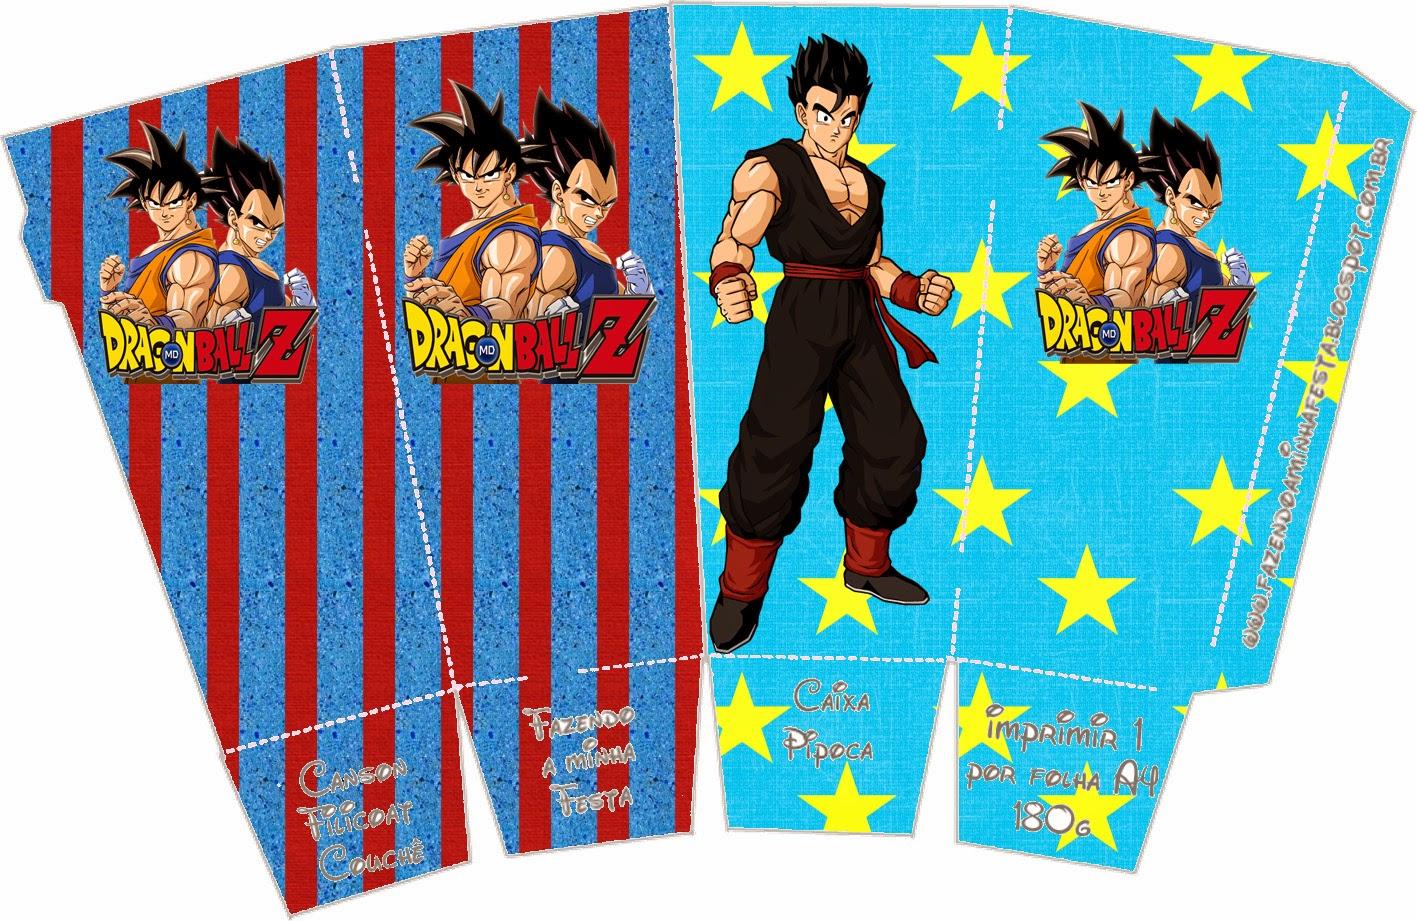 Dragon Ball Z: Cajas para Imprimir Gratis. | Oh My Fiesta! Friki